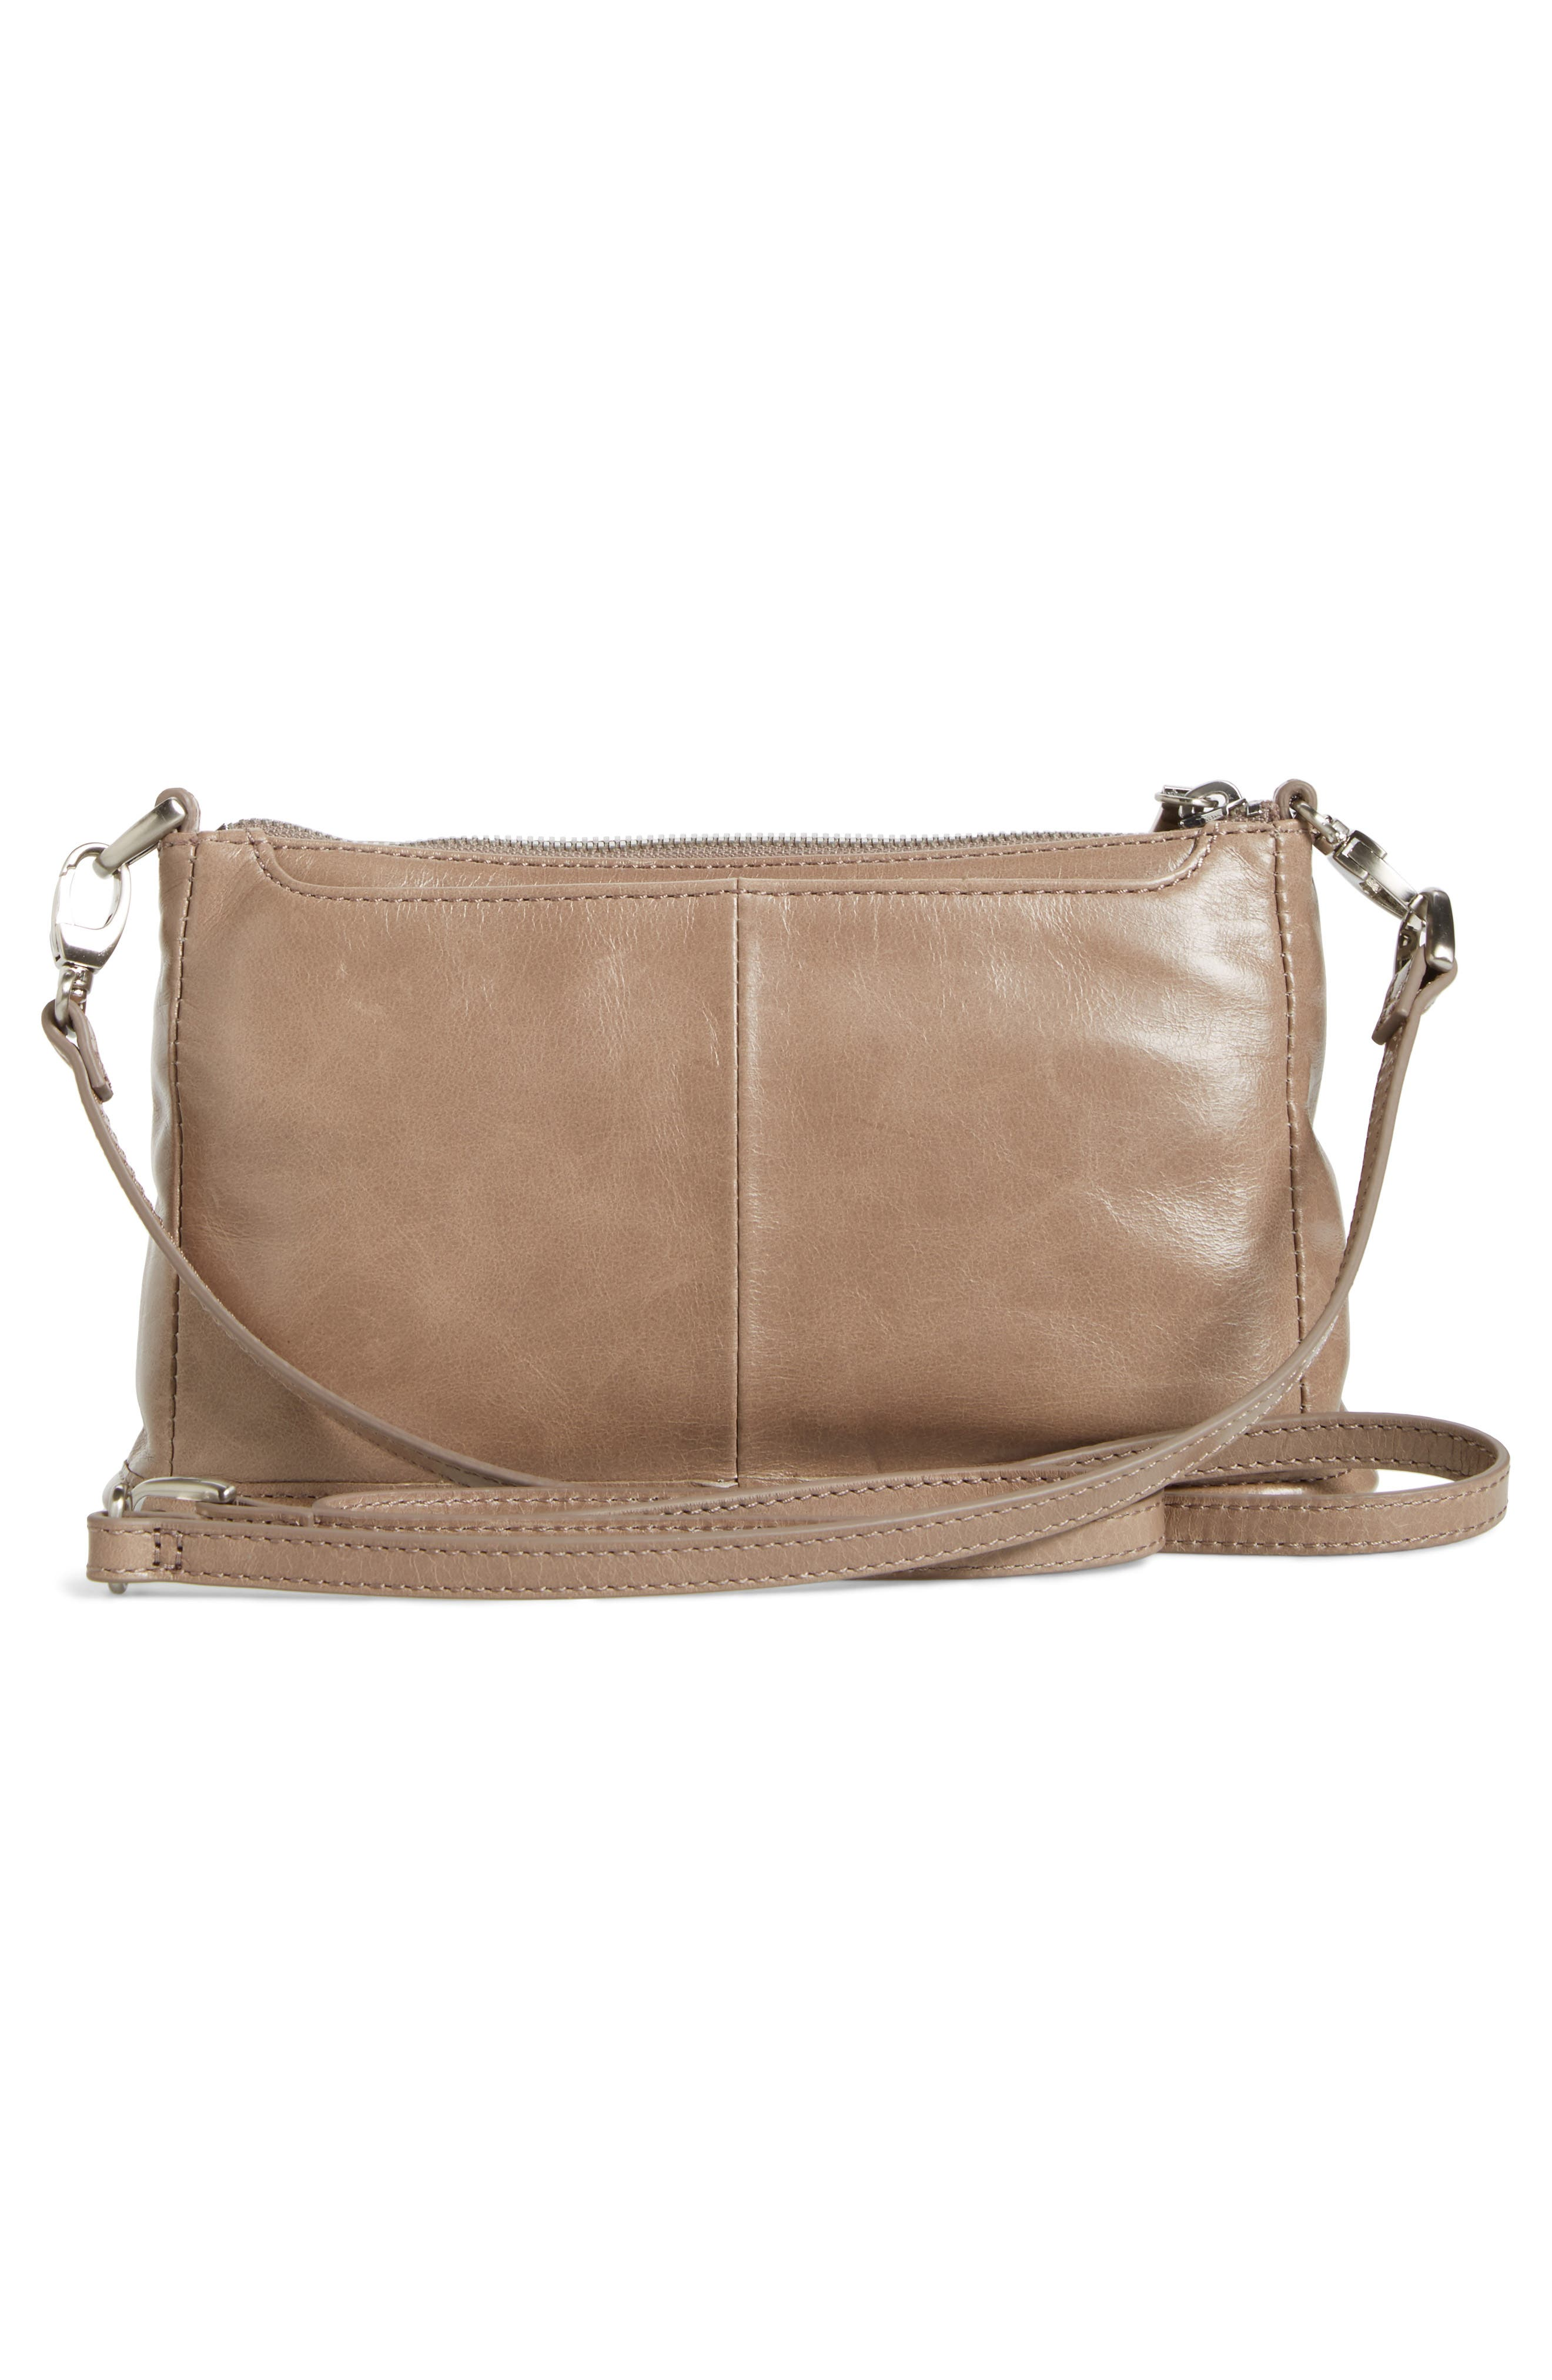 Alternate Image 3  - Hobo 'Small Cadence' Leather Crossbody Bag